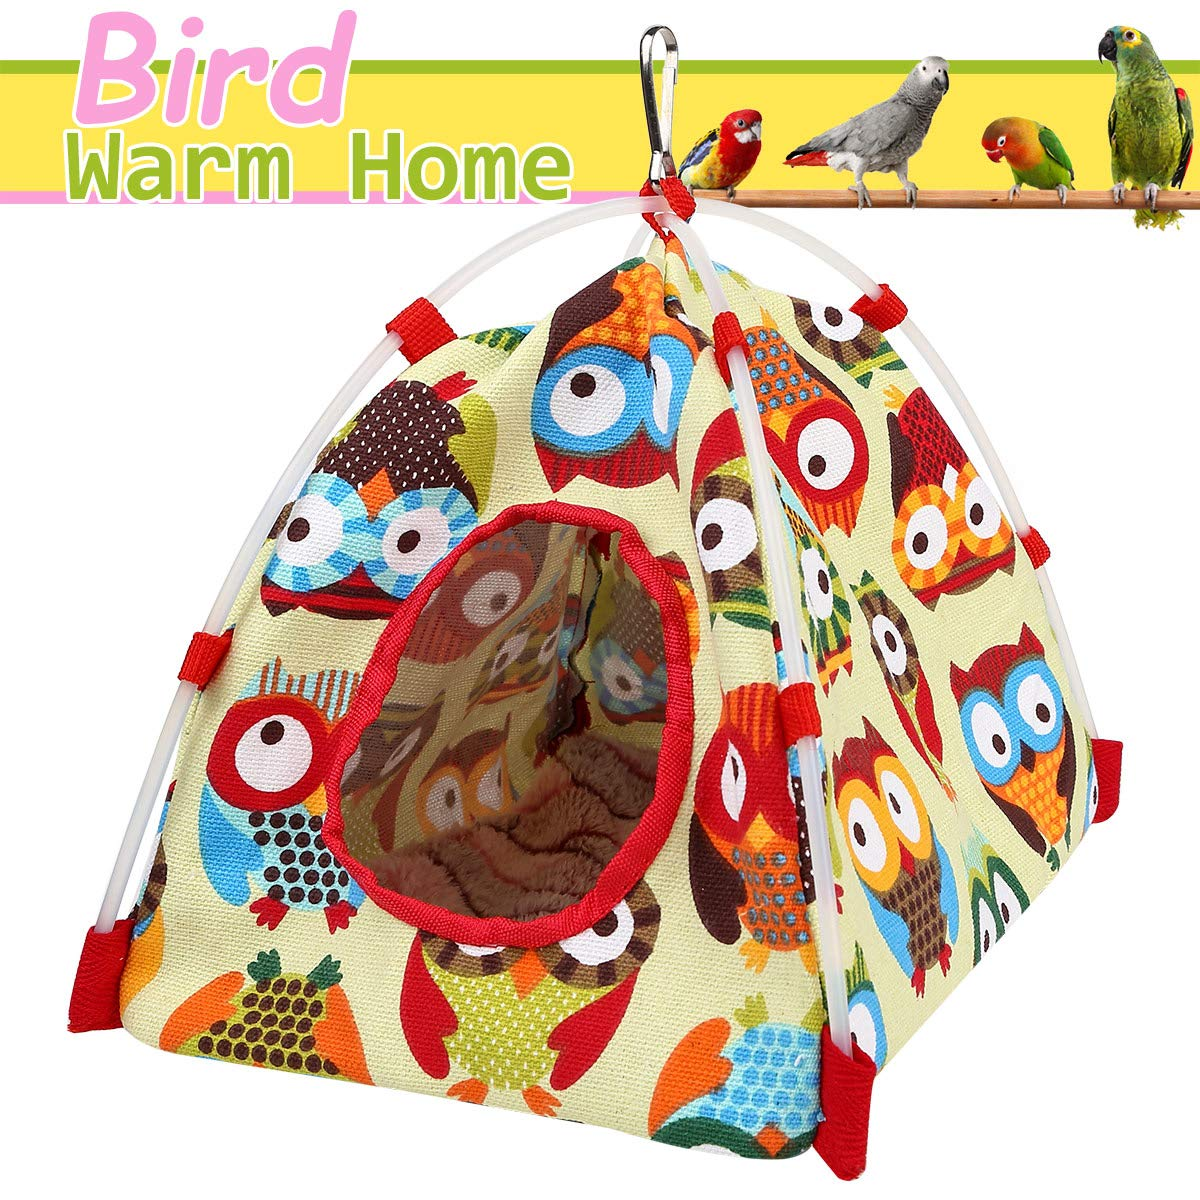 Aigou Bird Toys, Bird Hammock, Parrot Hanging Tent, Bird Nest House Bed, Parrot Habitat Cave Hanging Tent, Intelligence & Physique Improvement Cage Decor for Small and Medium Animals Parrot(Yellow)